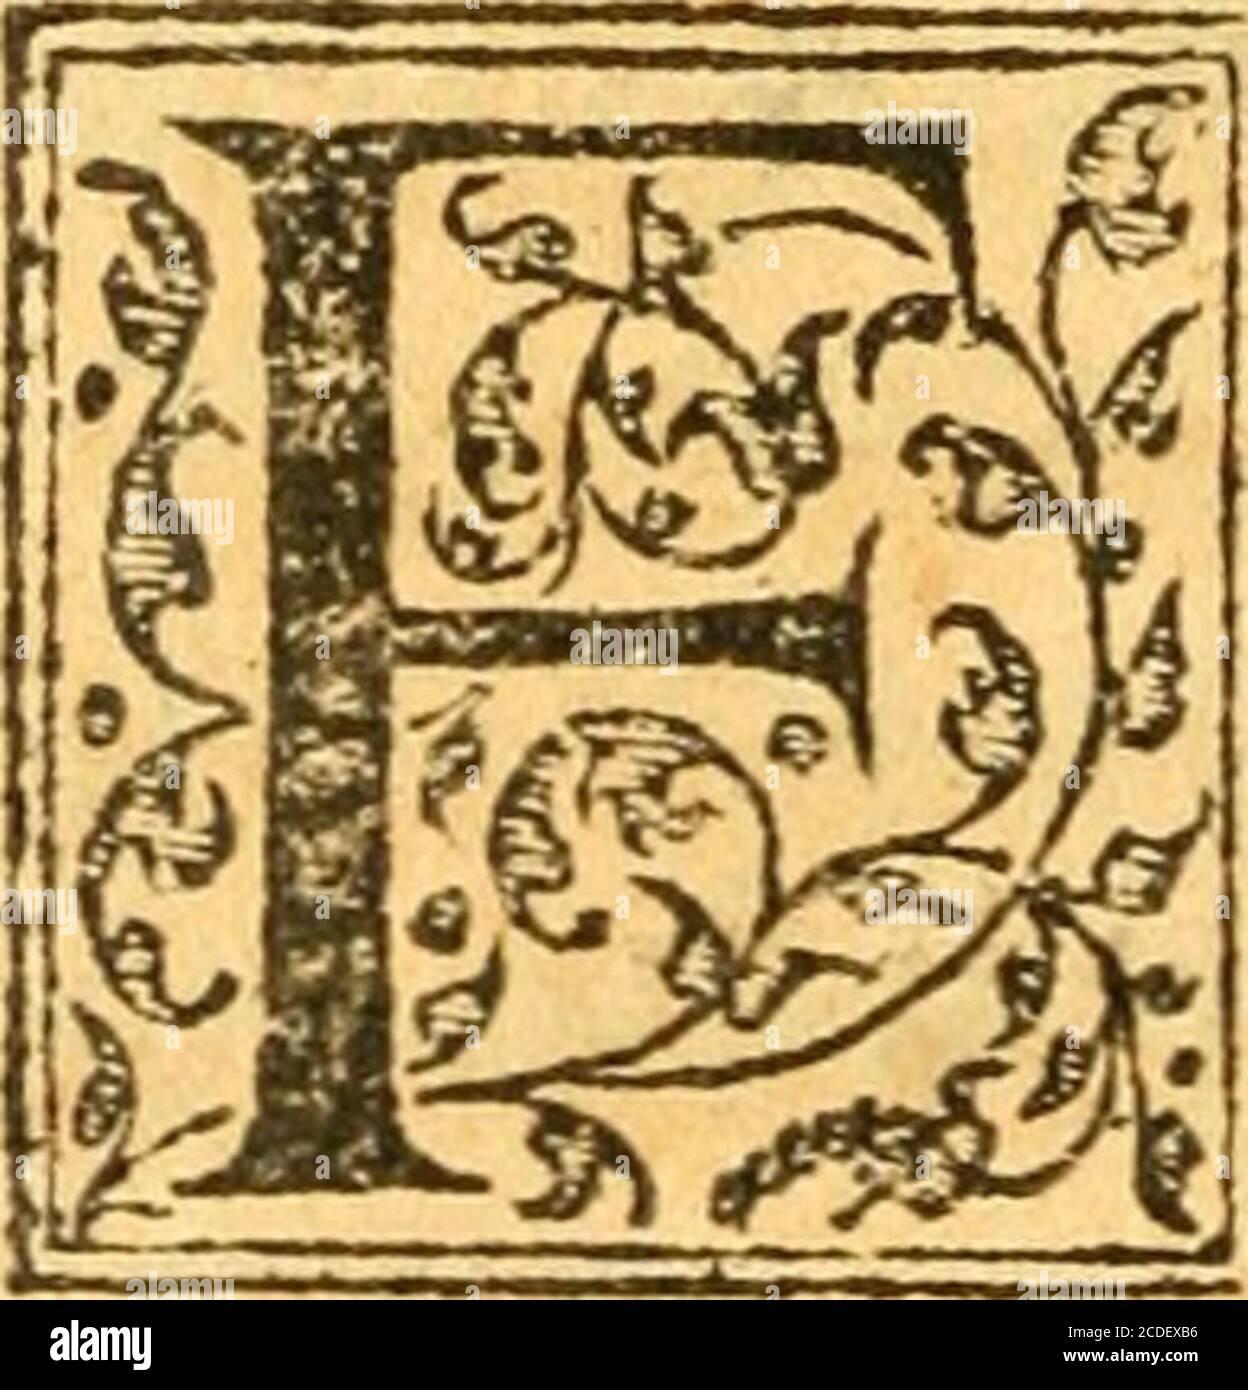 . Aeliani de historia animalium libri XVII . DEMETRII CON- fiantinopolitamp de ctira tf medicina acci- -pitrumy LIBER SECVNBVSy PETRO GILIO iNTlRFRF.xe. ?? difficulté cm fpirandi. Olll> coili>myYhji mafcuU)(picx IndijCyce^heos^theriacjs, caryophiyfandarachjCypithri^olehgalbani)maslkhj^>fmorum^ ^ncia:yitio yeterimadsudri^Uhiplisi kapt^Uhiplisi kapt Banque D'Images